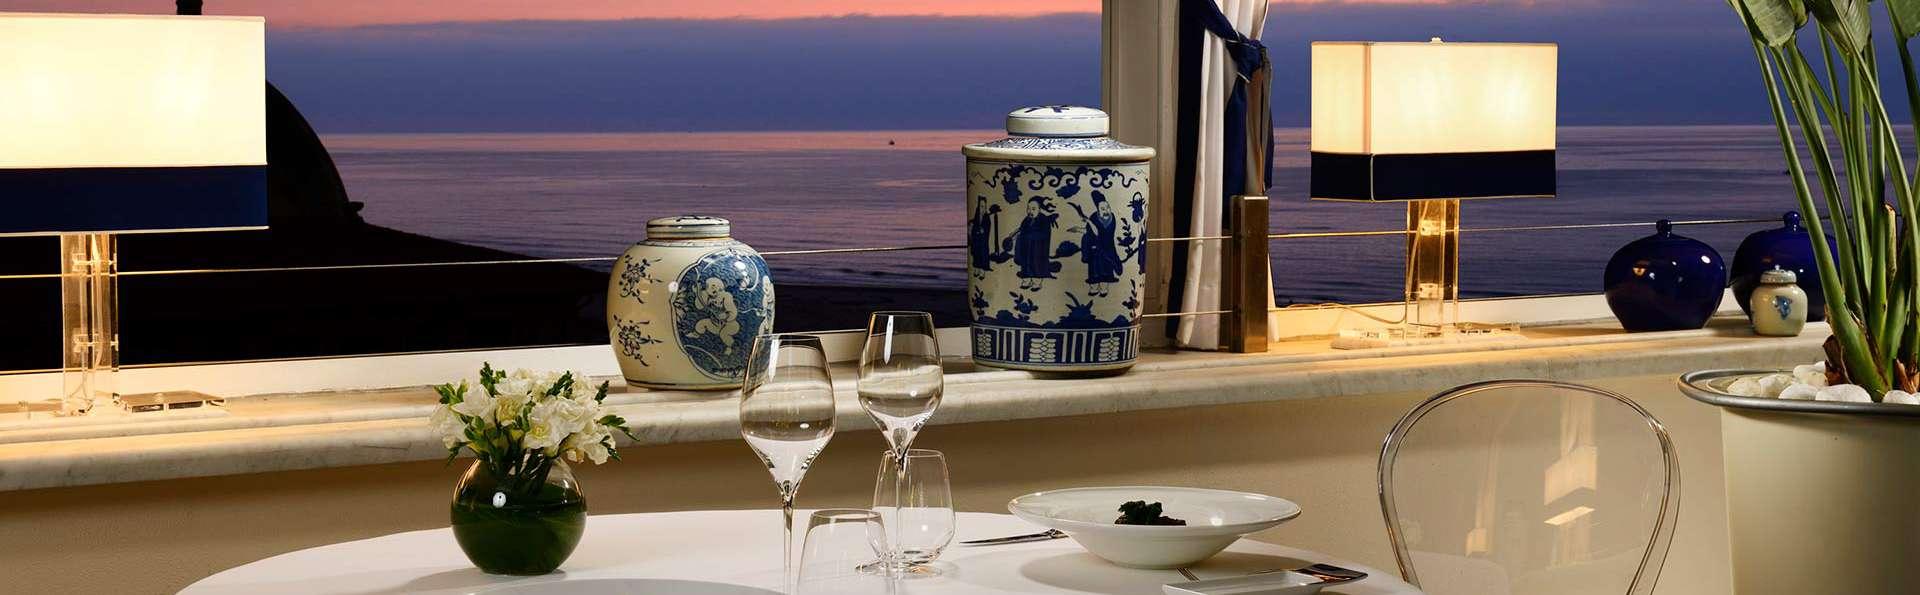 Séjour à Viareggio avec dîner et accès au spa